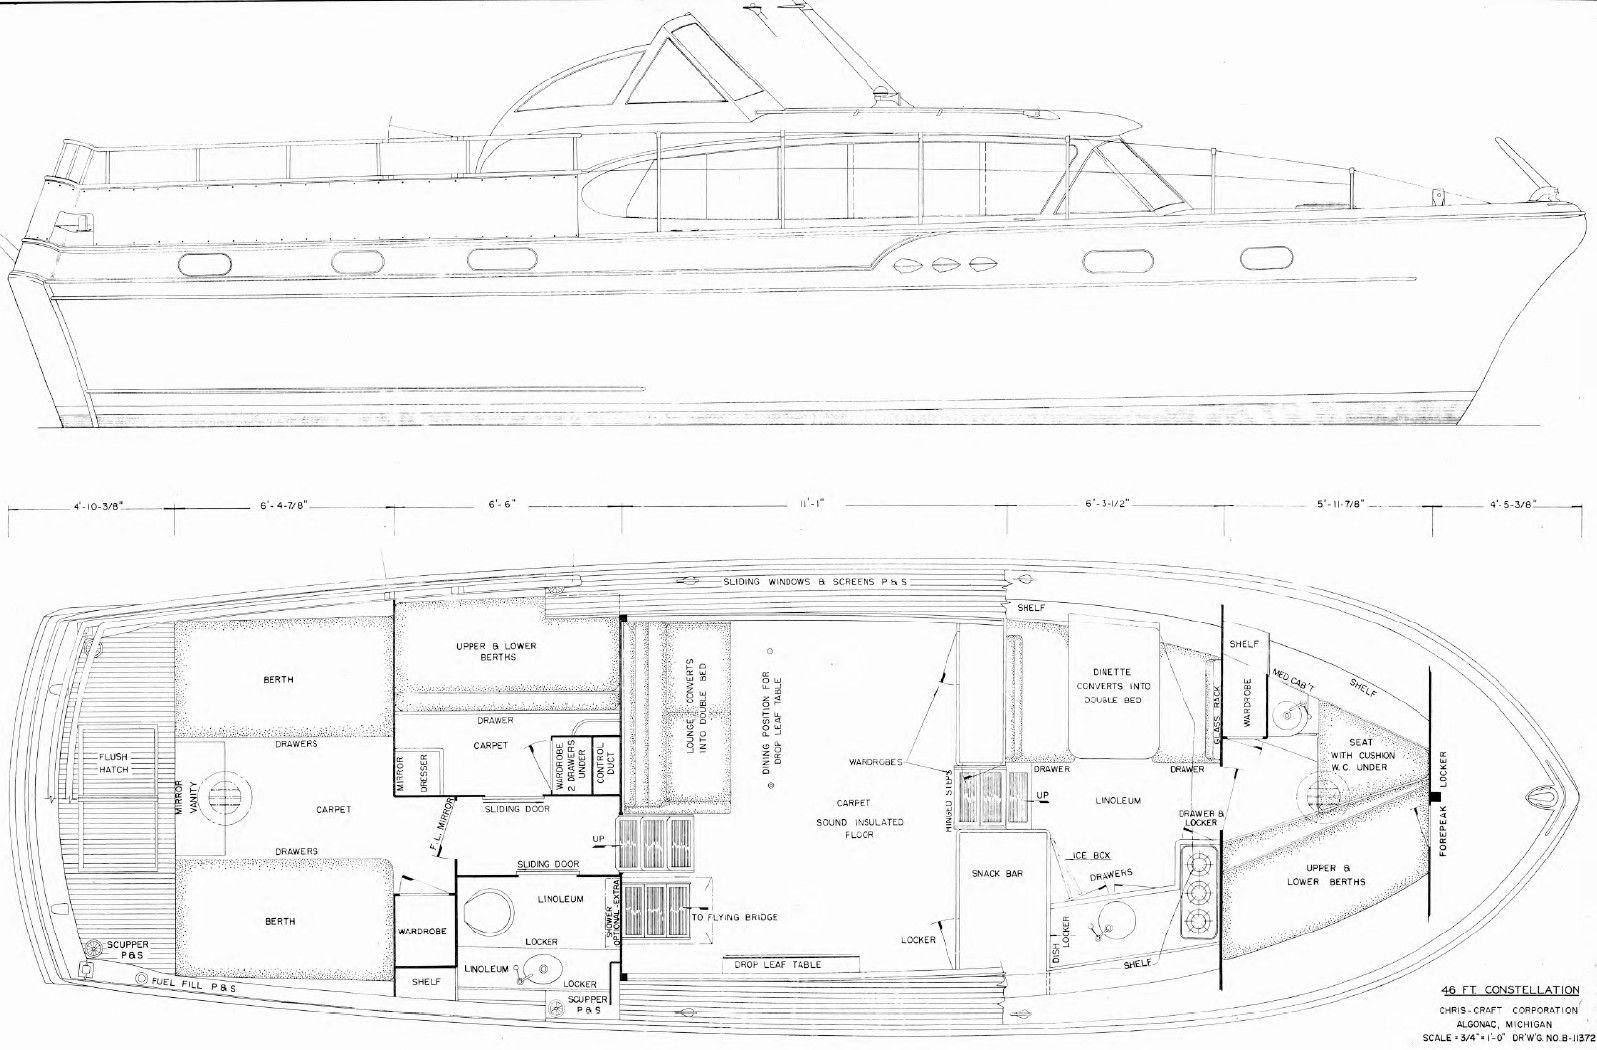 Wiring Diagram 6 Volt Generator Chris Craft Schematics 1957 46 Constellation Plan Drawing Motor Farmall Regulator